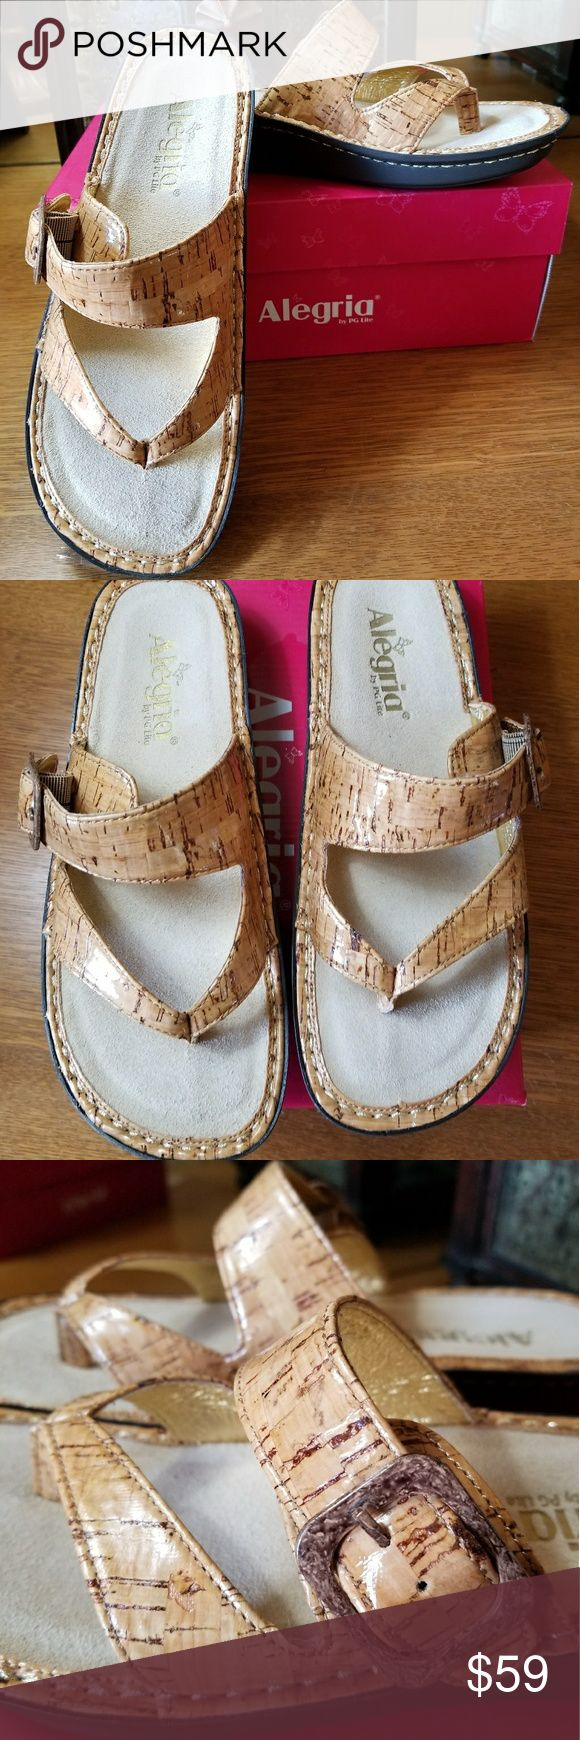 ALEGRIA Sandal NWOT Alegria Patent Cork Sandle Alegria Shoes Sandals